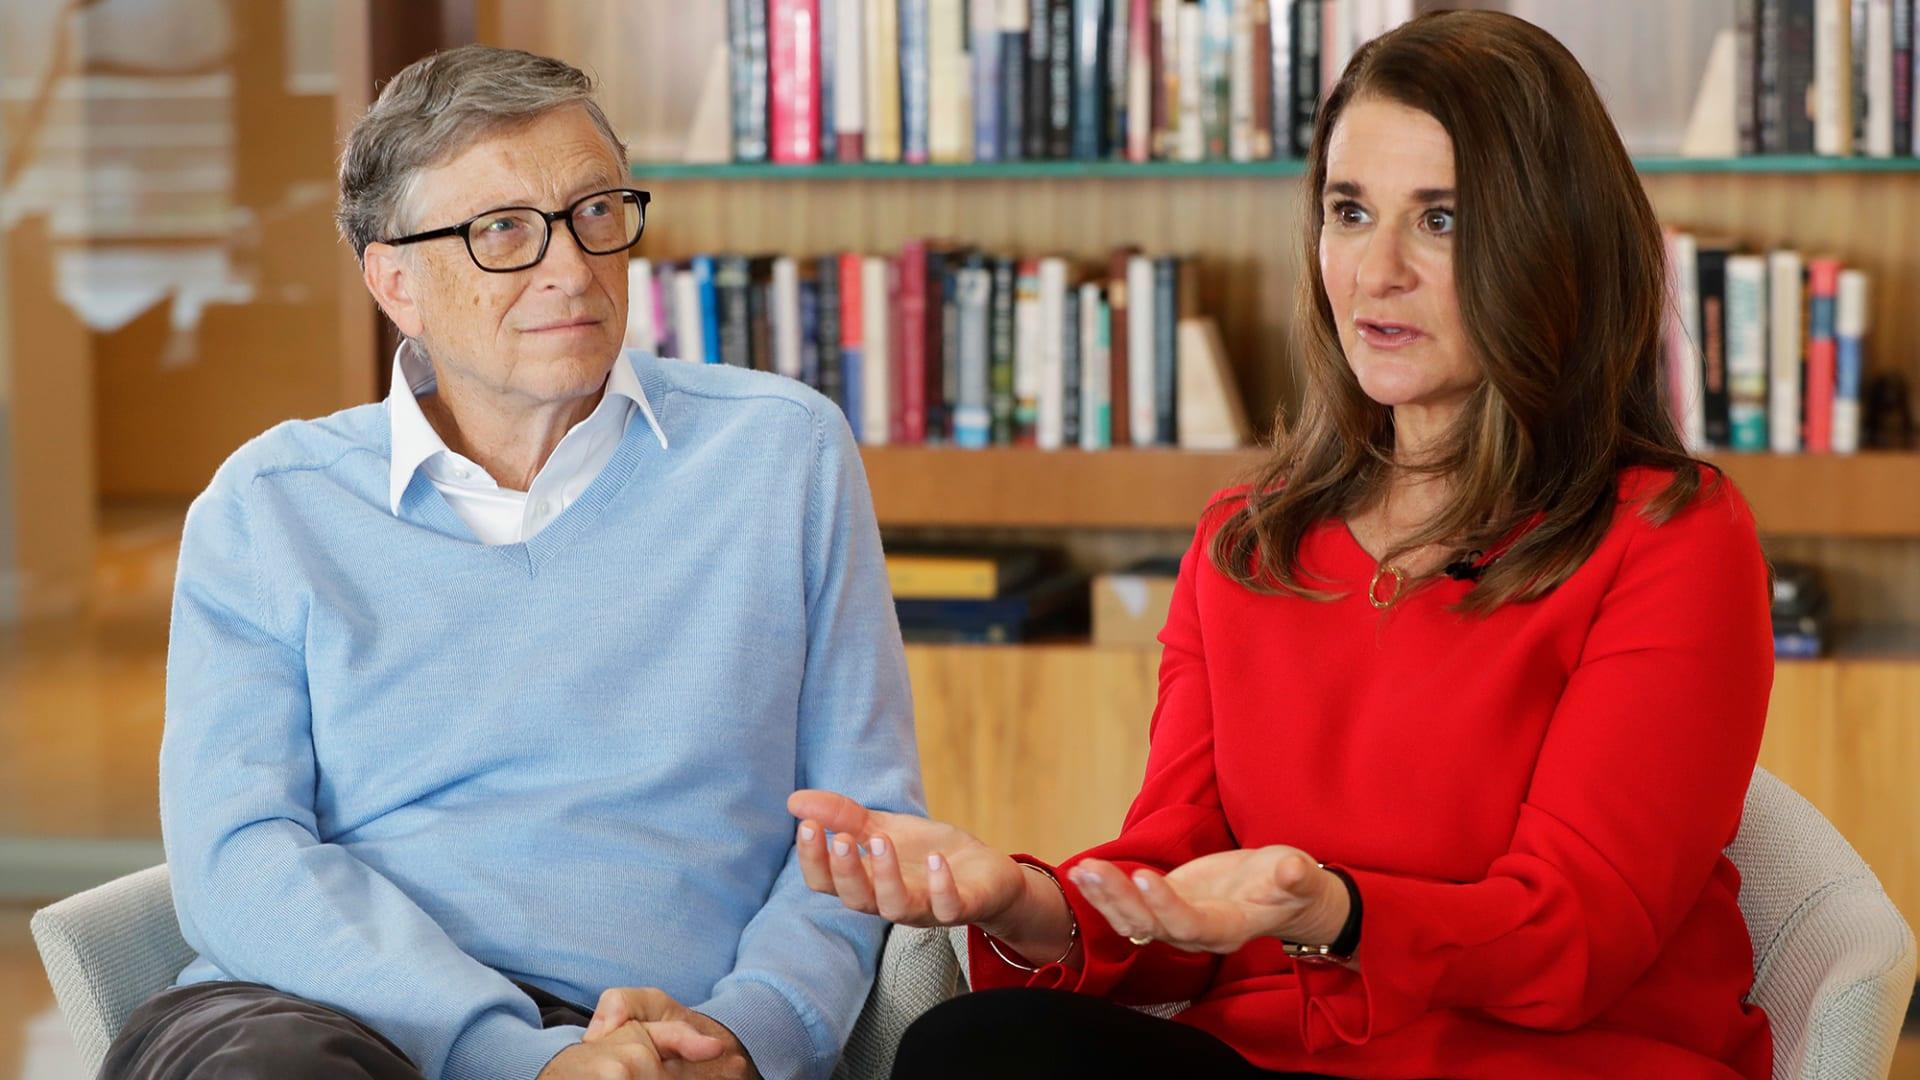 بيل غيتس وزوجته ميليندا يعلنان انفصالهما بعد زواج دام 27 عاماً